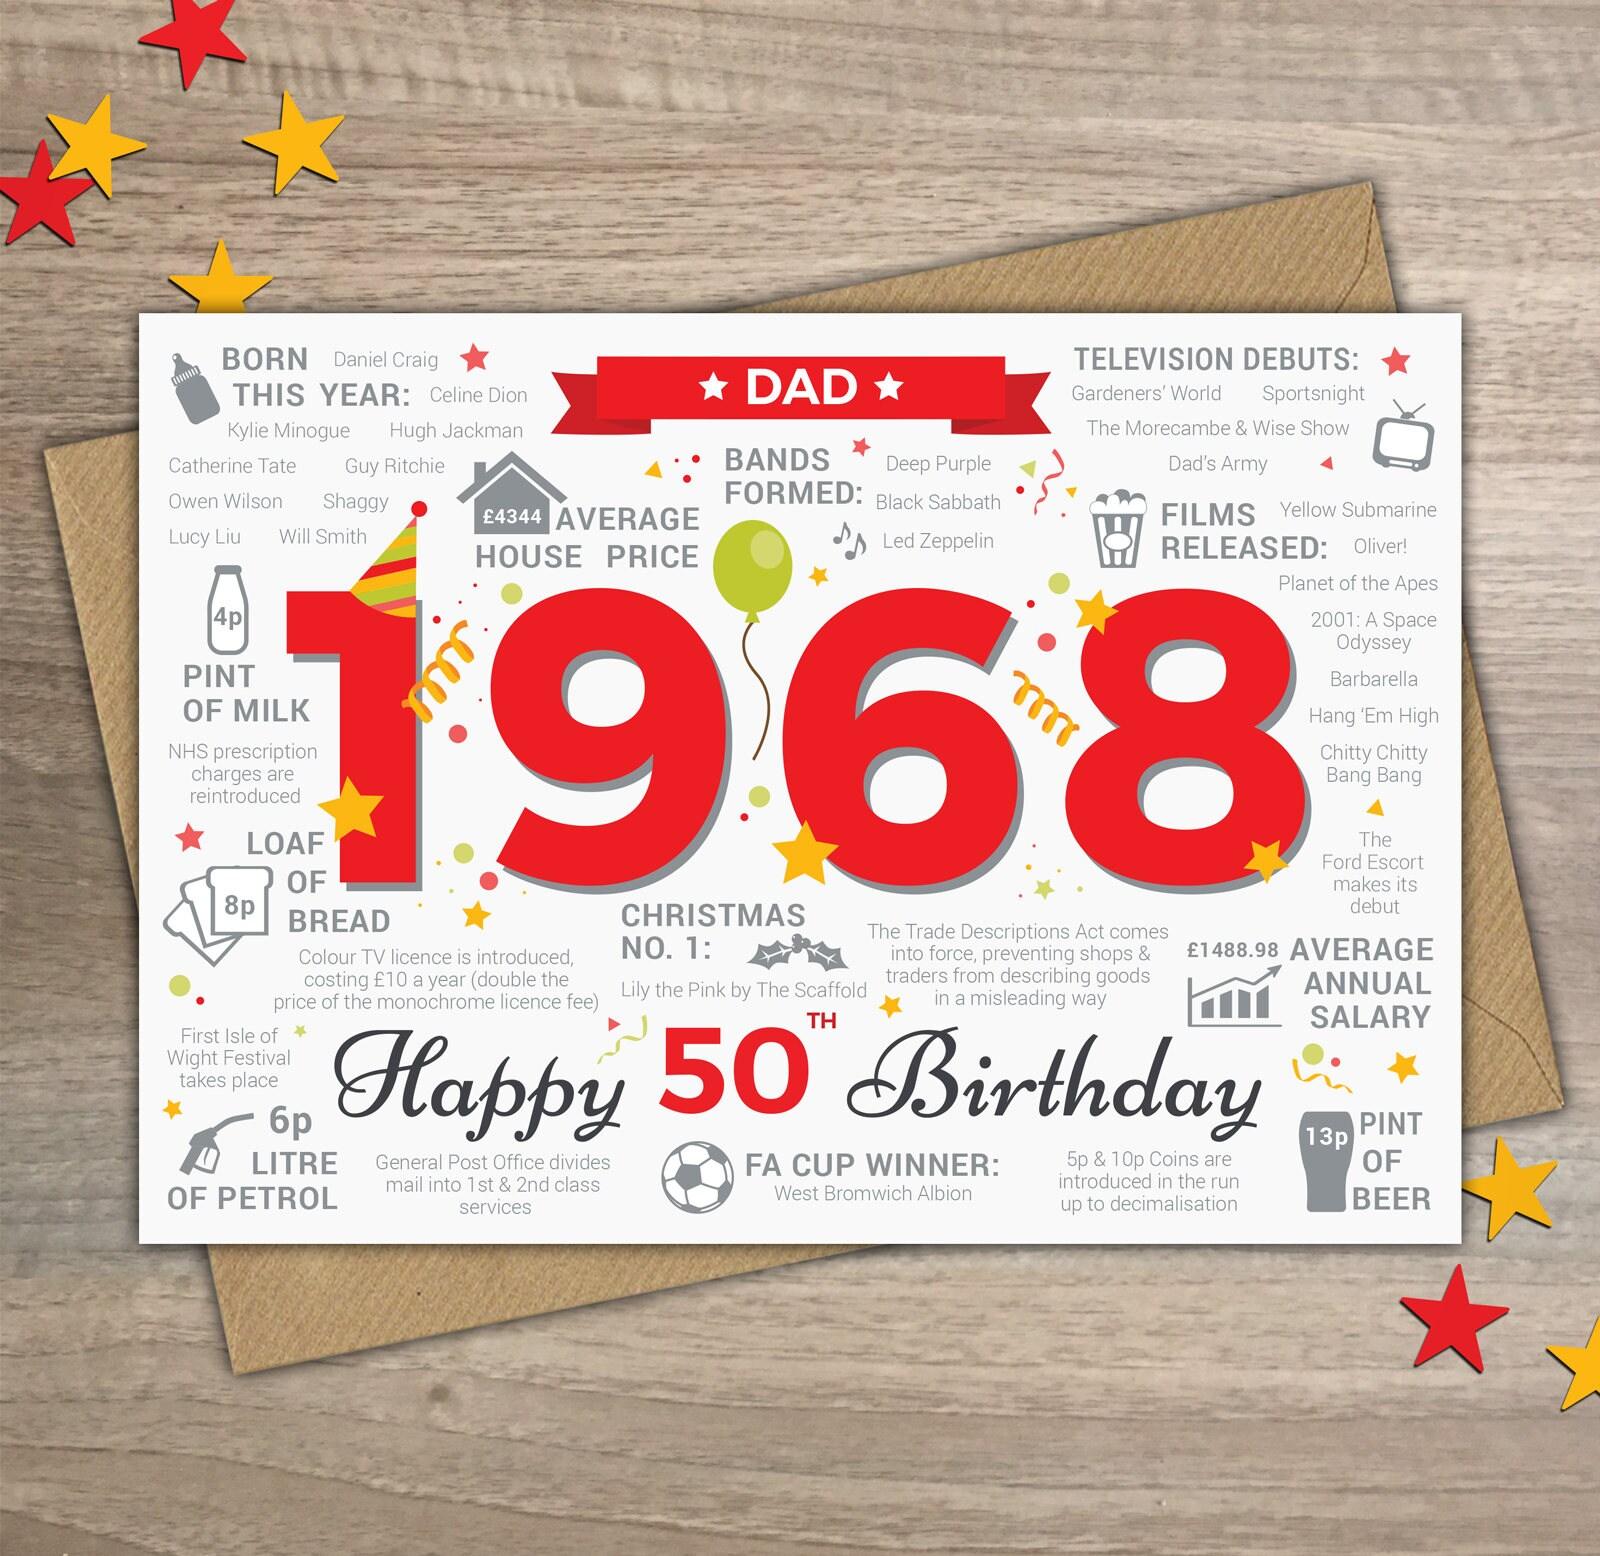 Happy 50th Birthday Dad Greetings Card Born In 1968 Year Of Etsy